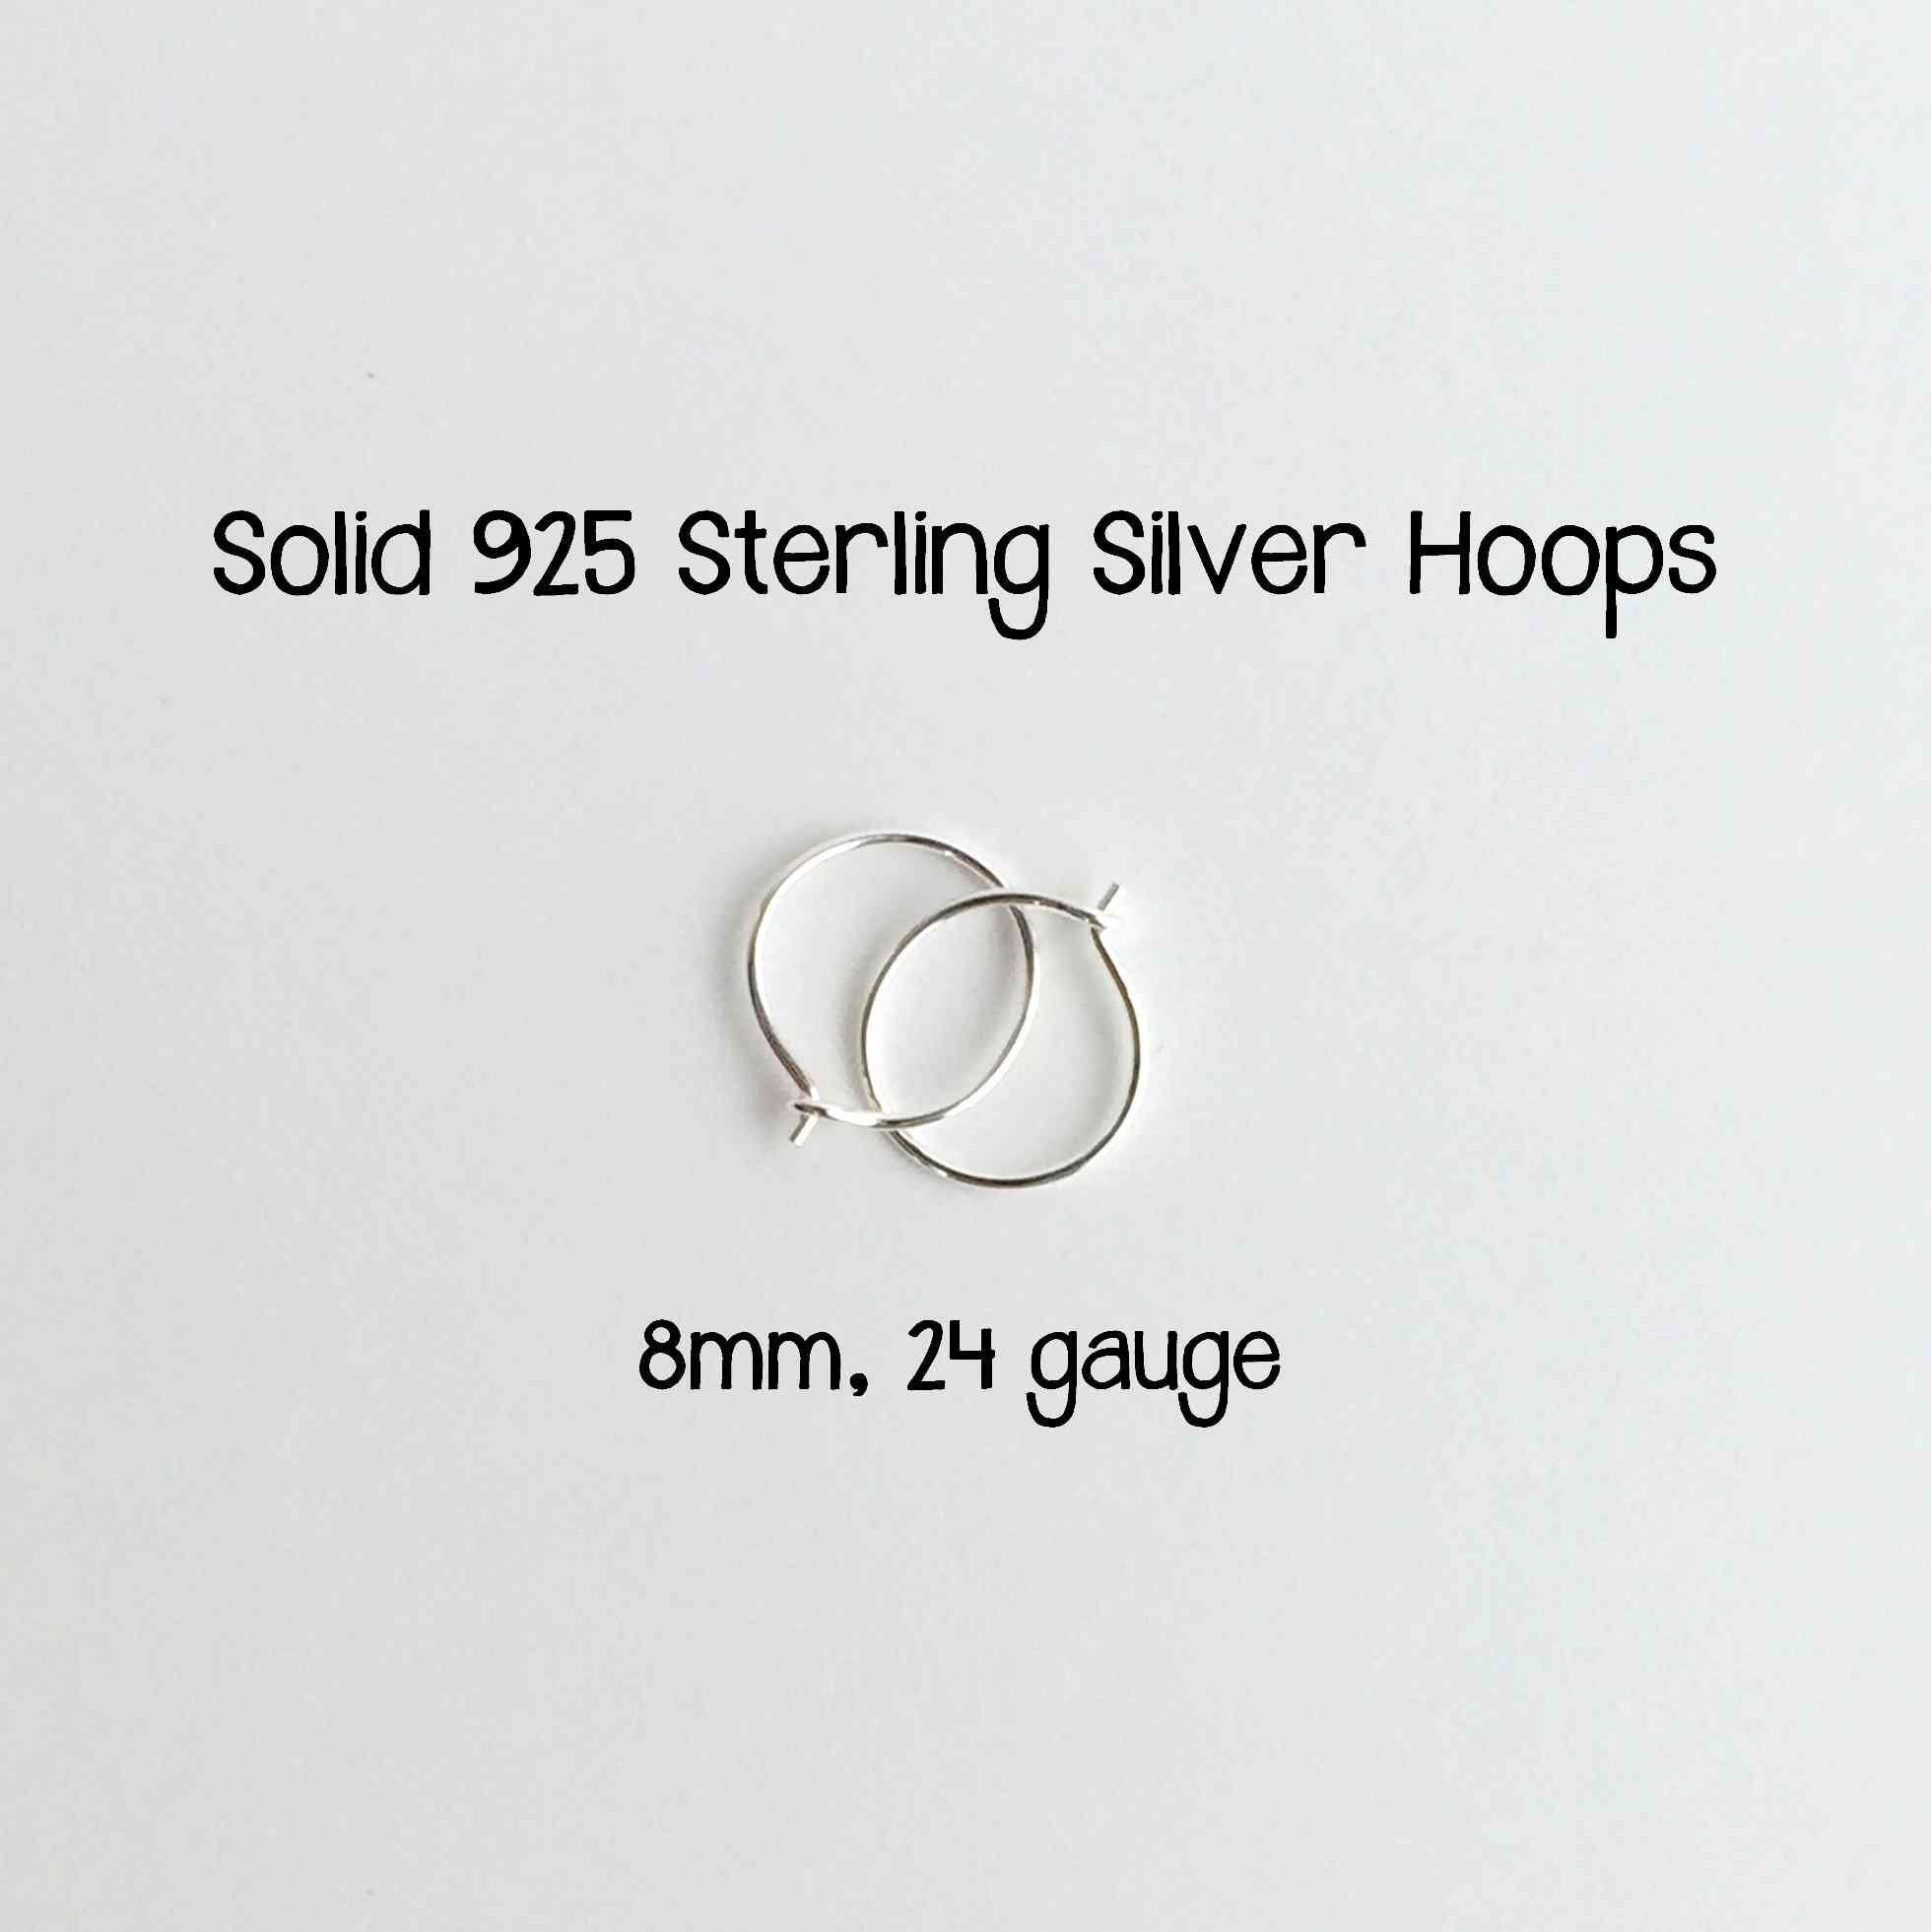 Mini Sterling Silver Hoops 8mm 24 Gauge (Extra Thin Hoops)